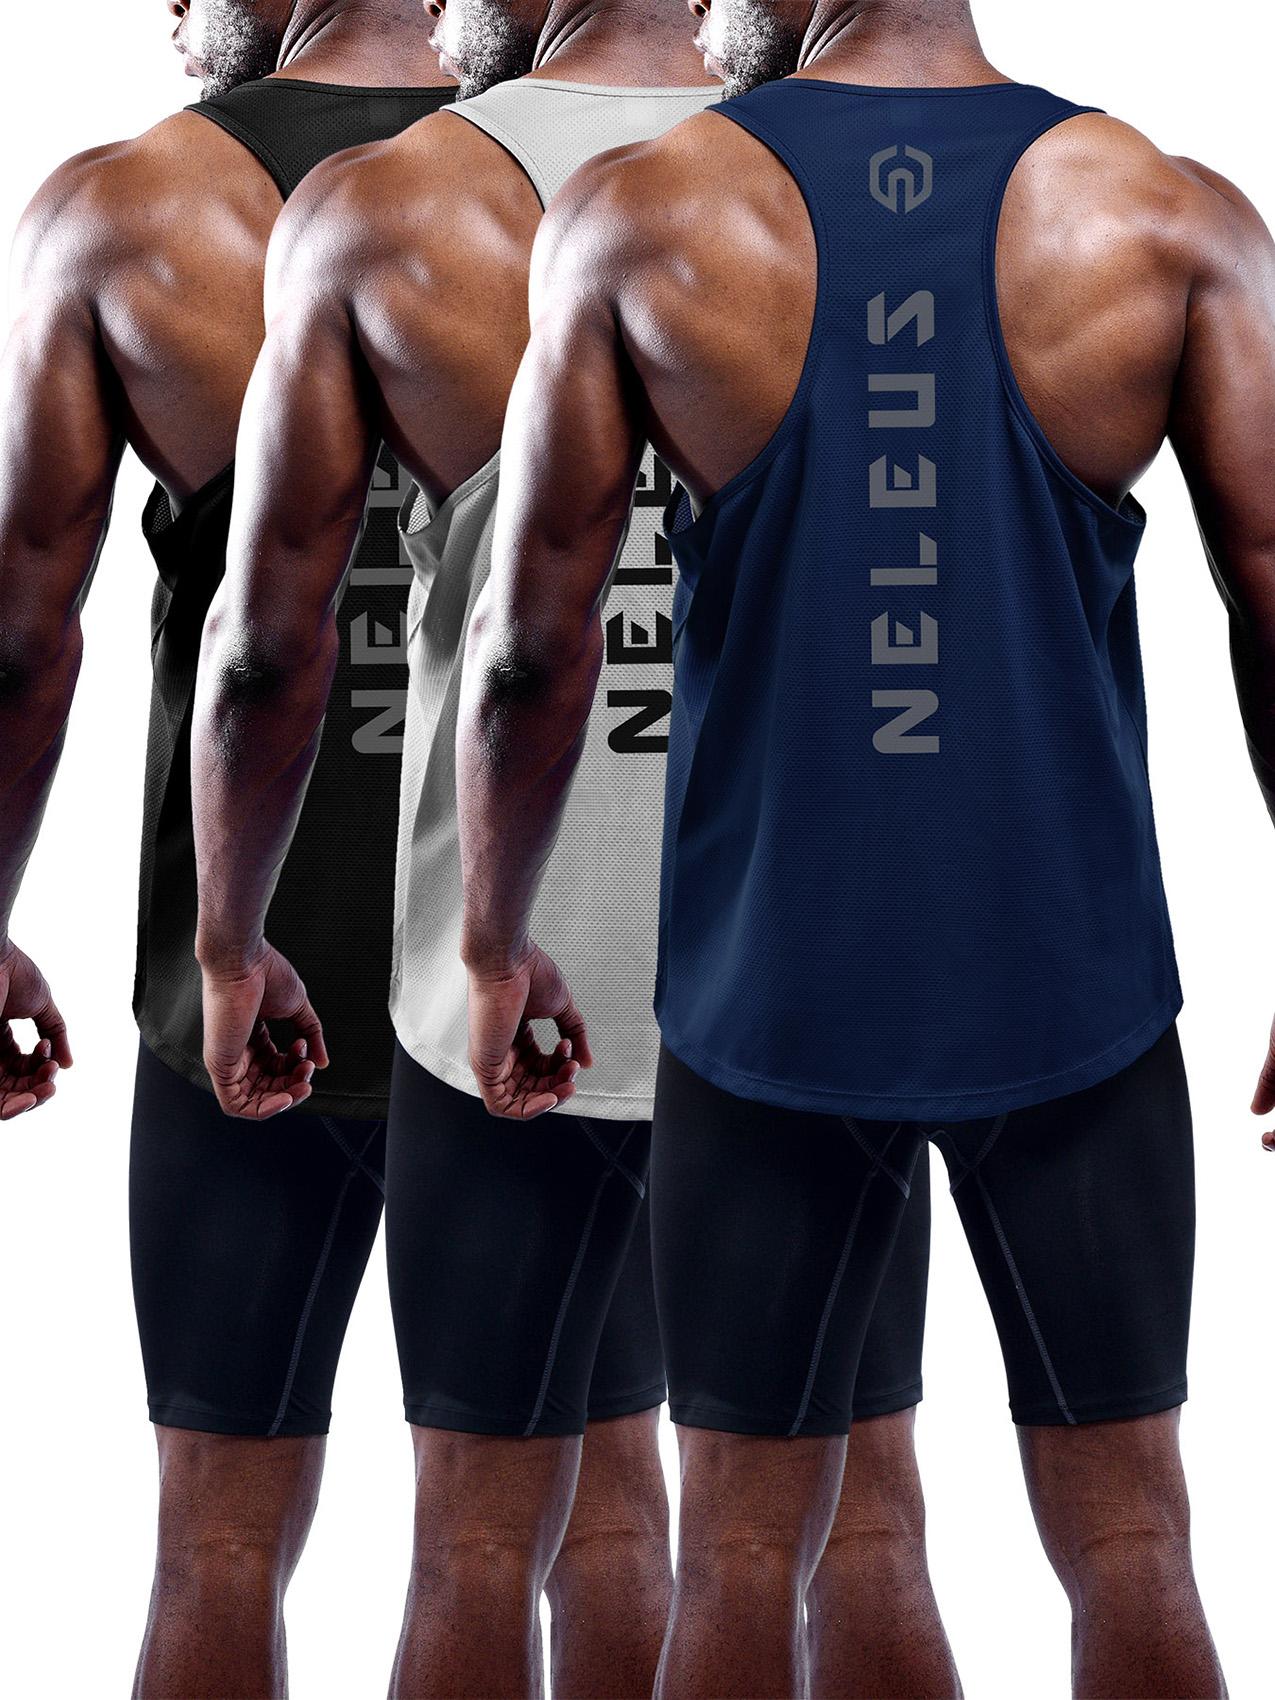 1ee6f80c12ac74 Neleus Men s 3 Pack Dry Fit Y-Back Muscle Tank Top